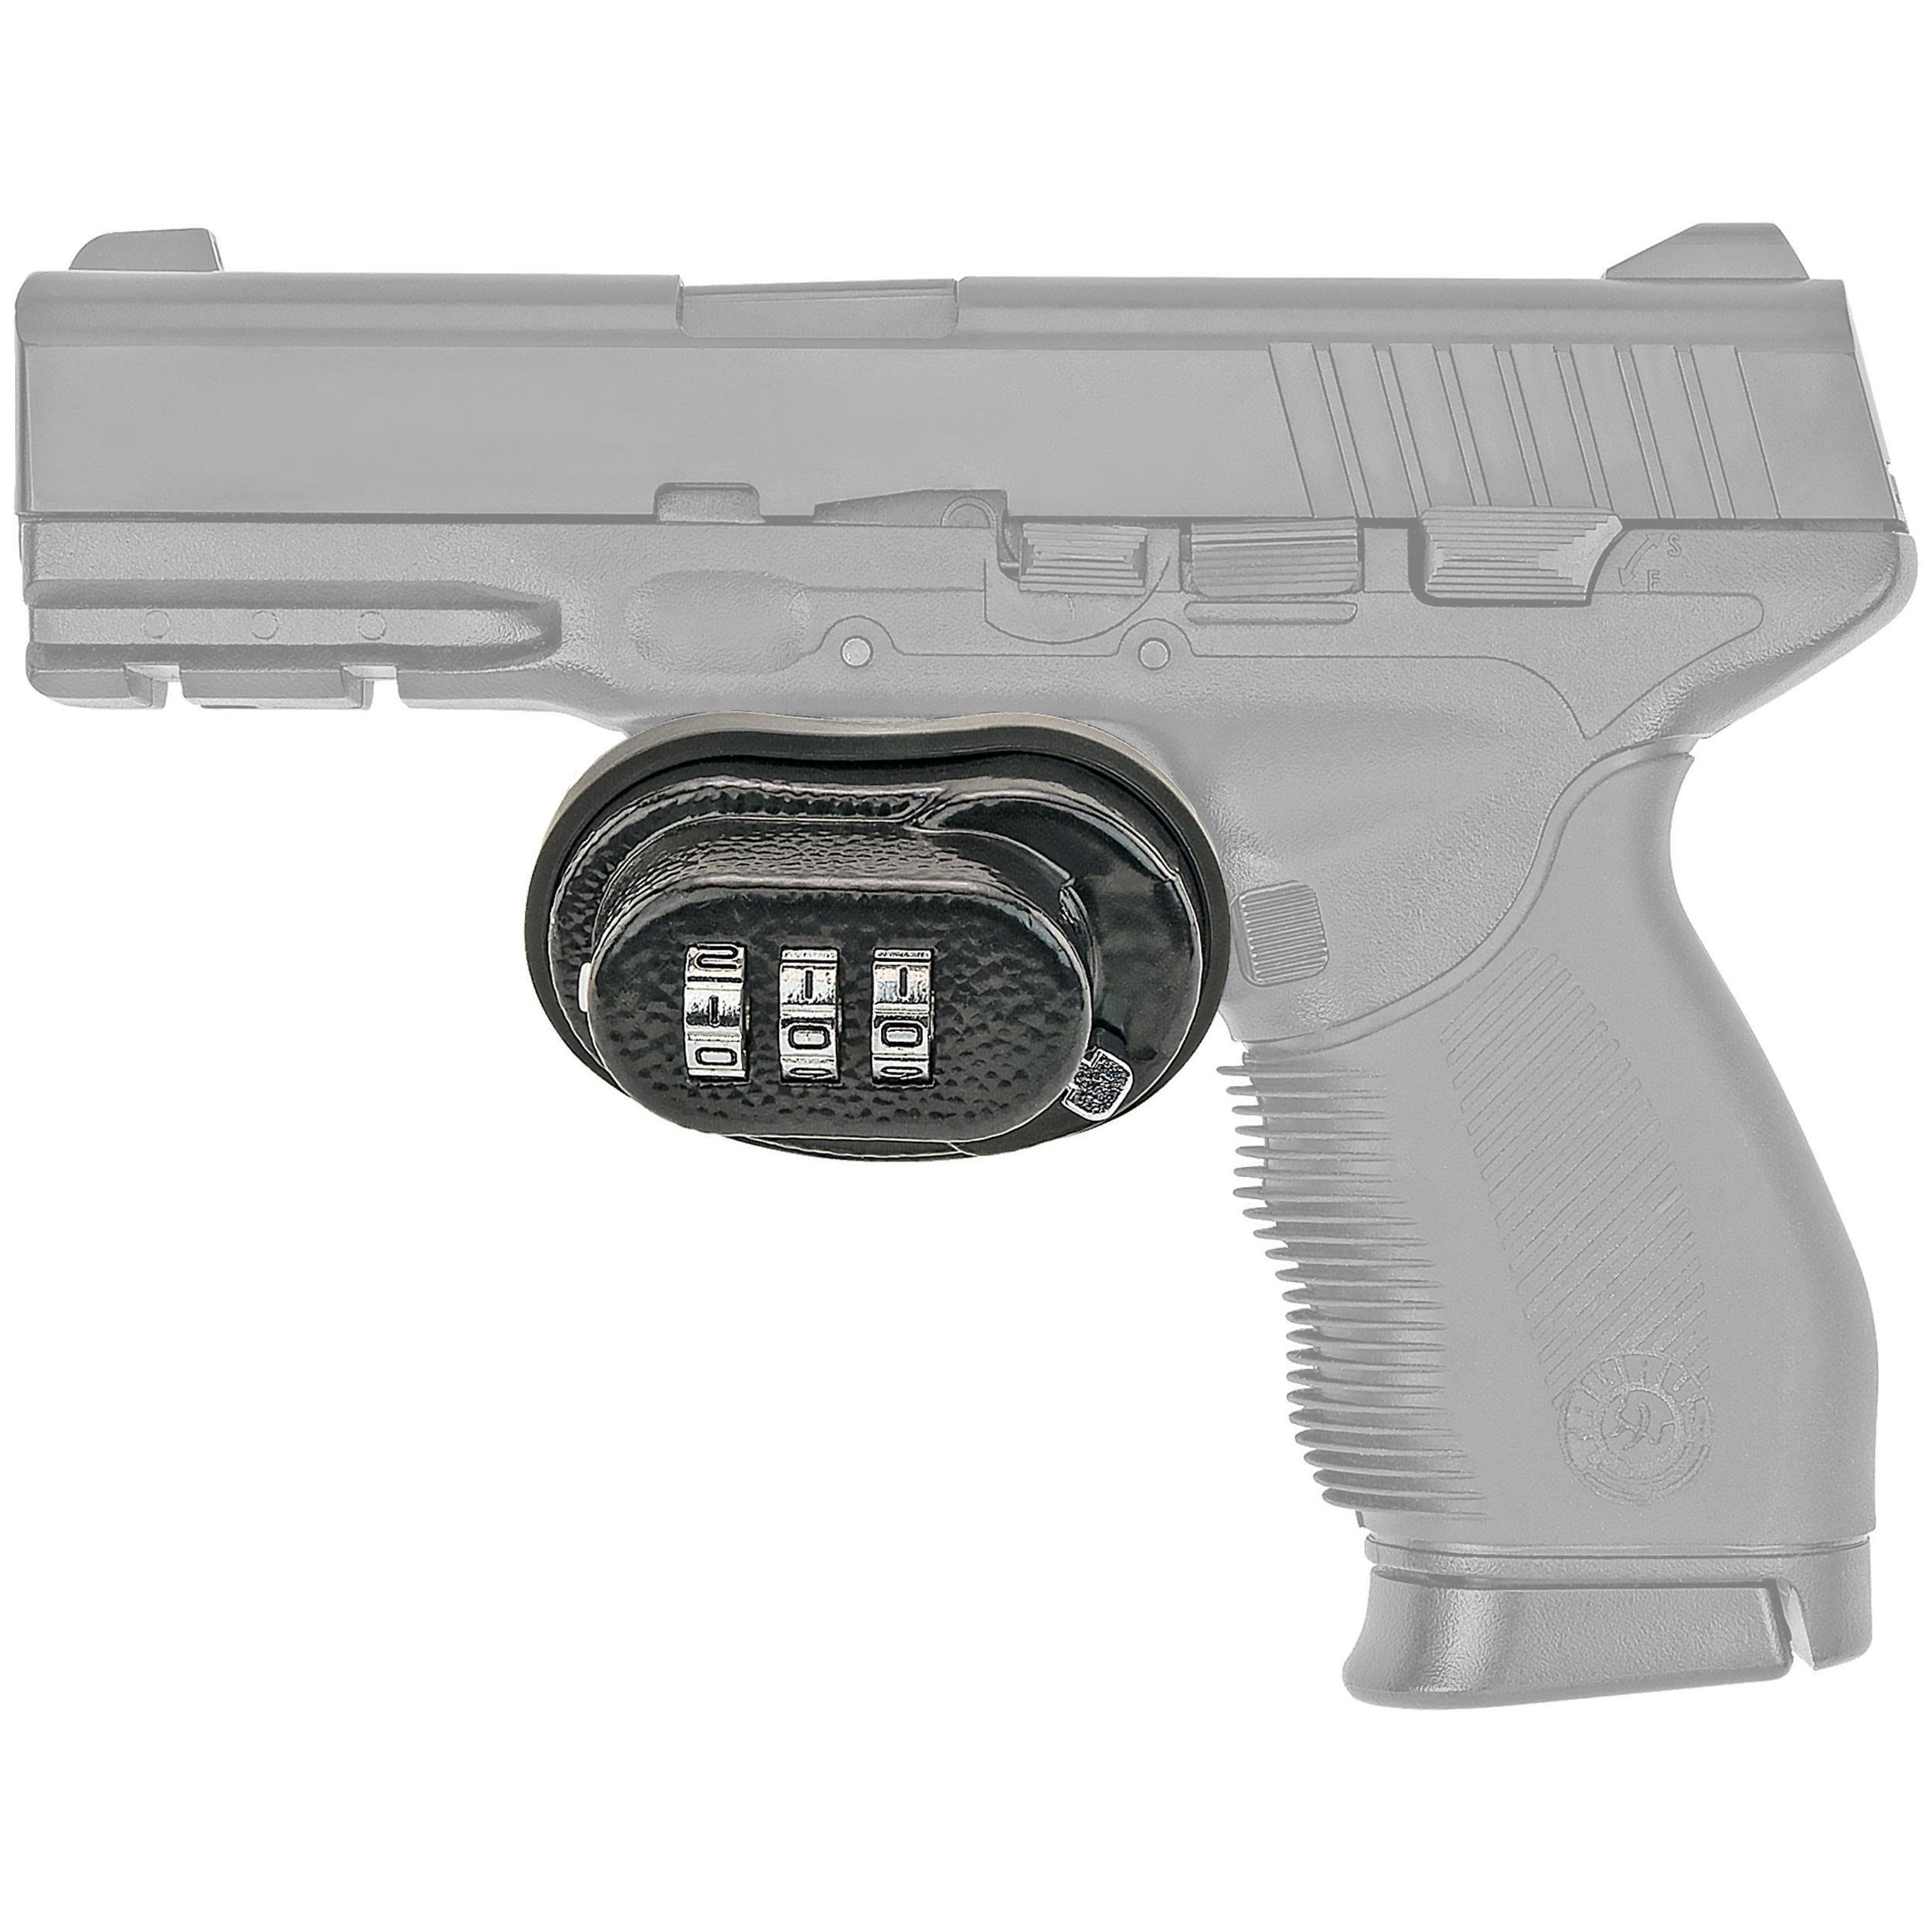 3-Digit Combination Trigger Gun Lock